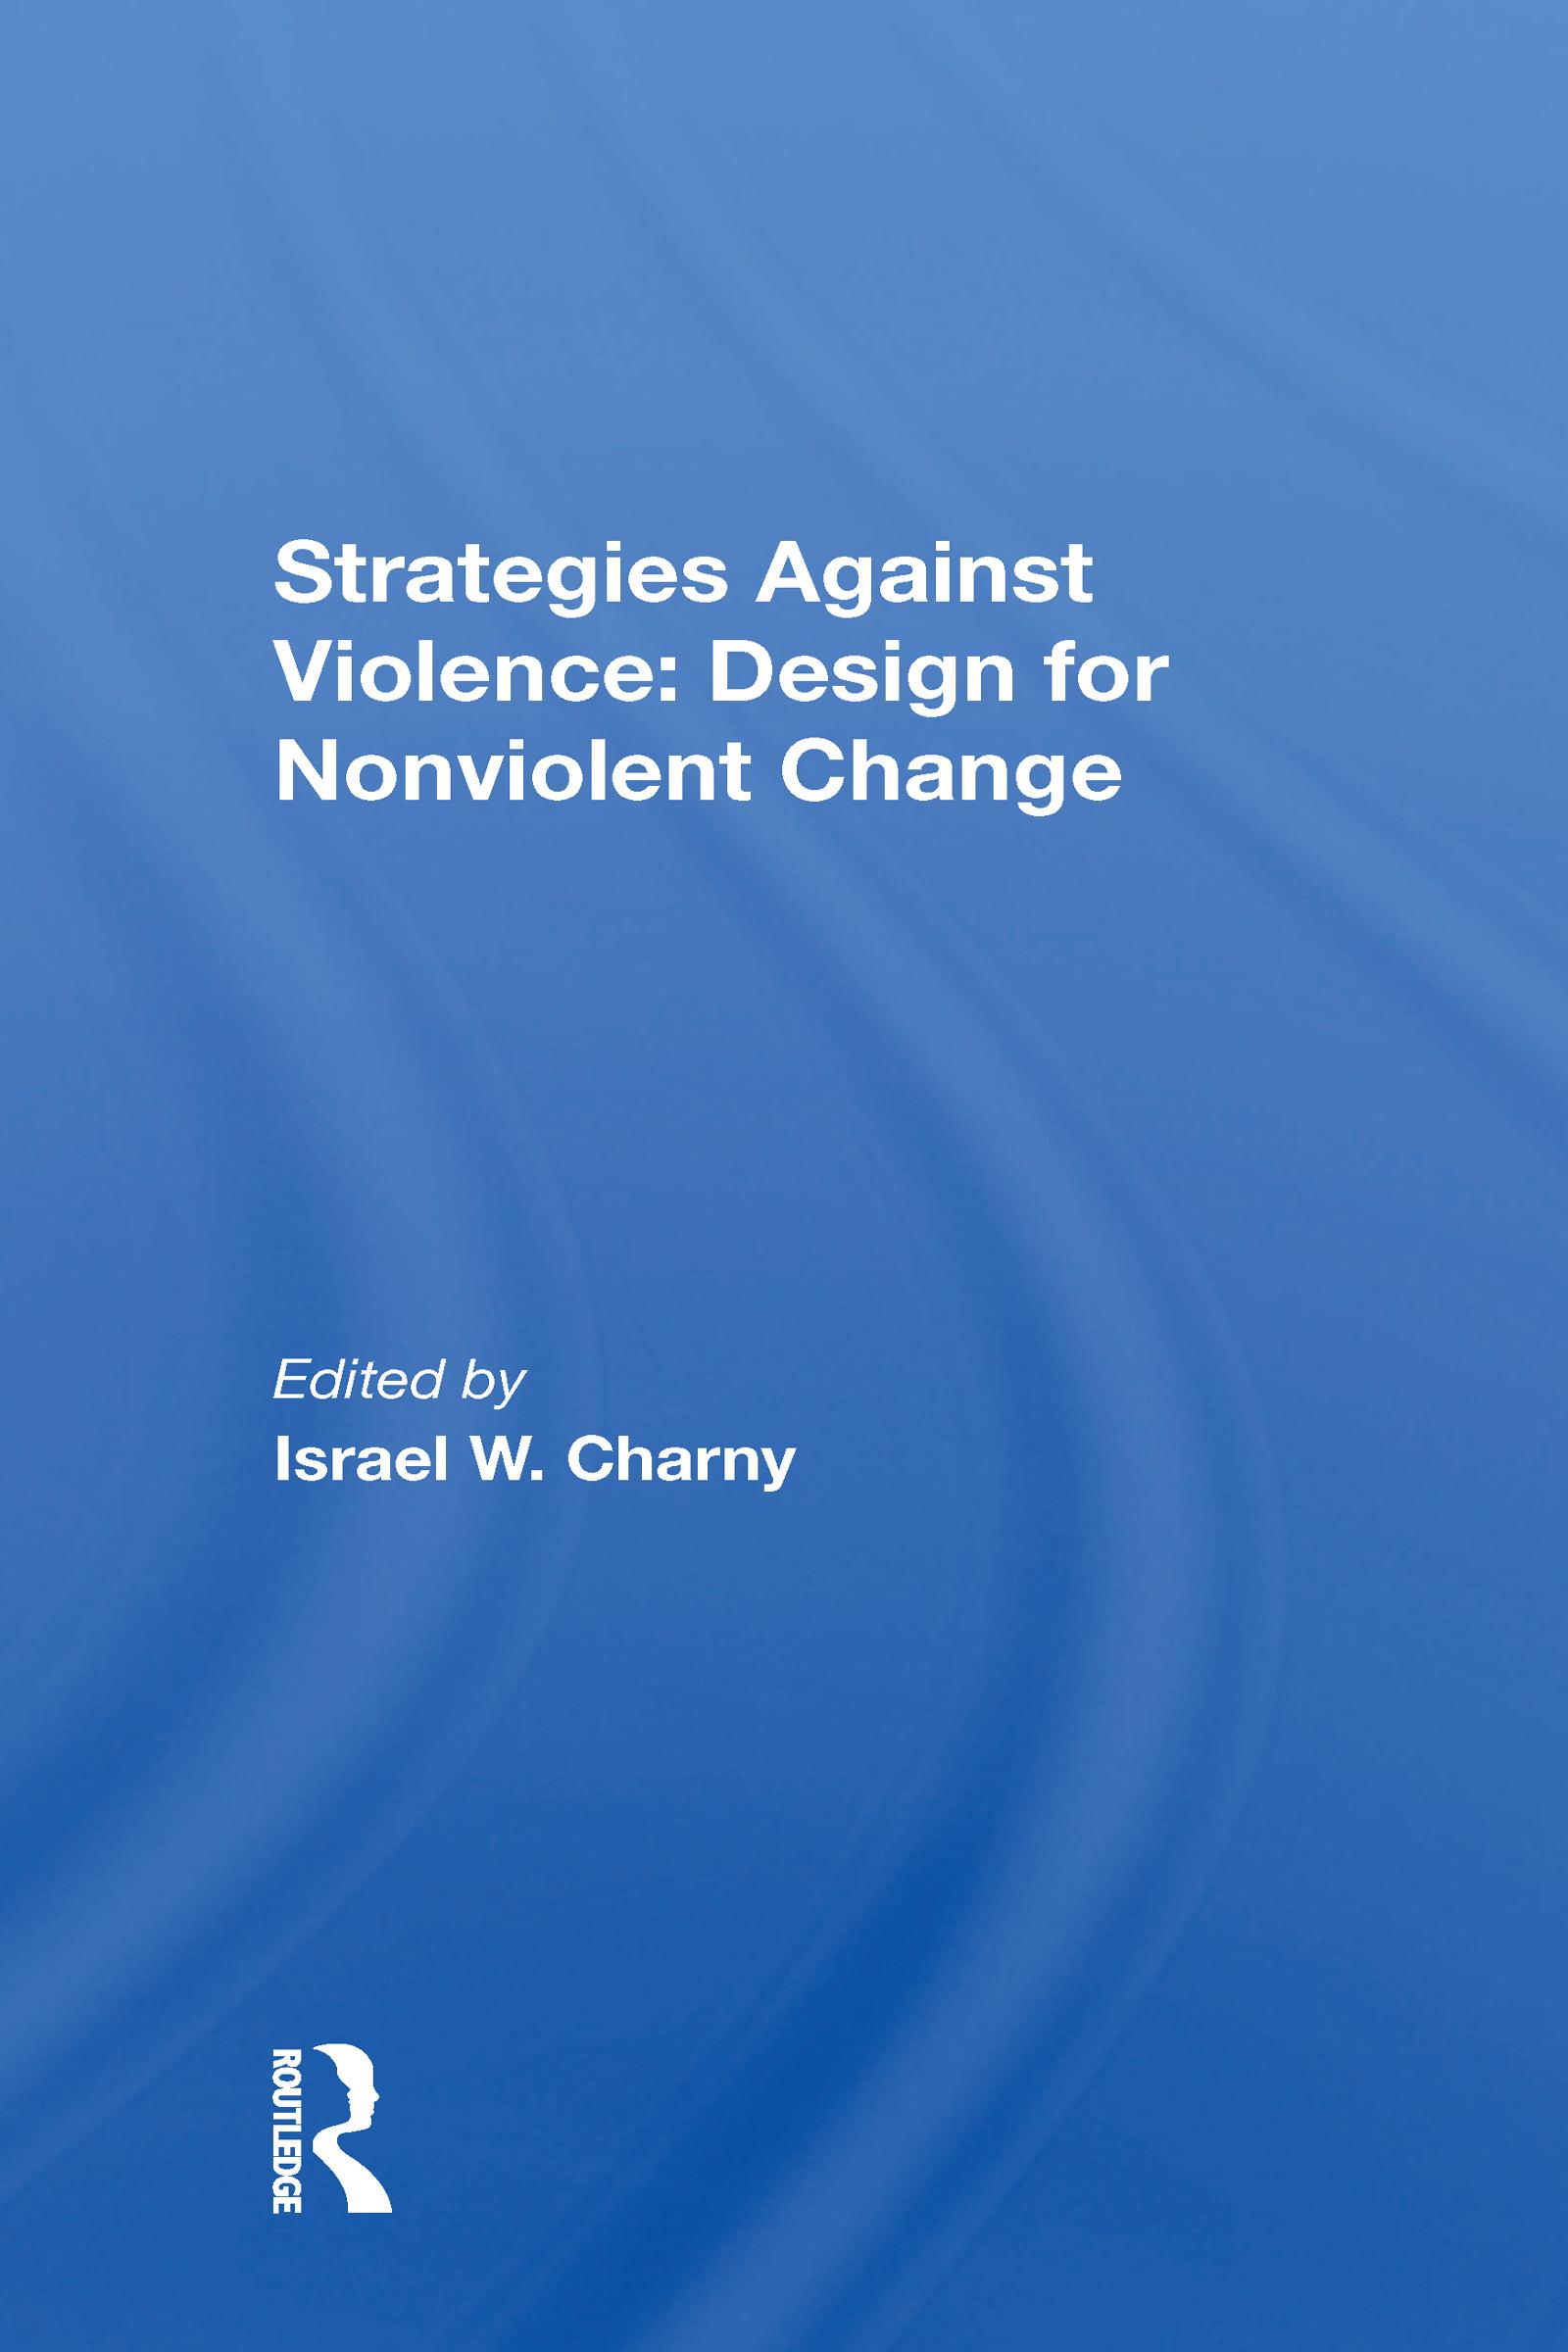 Strategies Against Violence